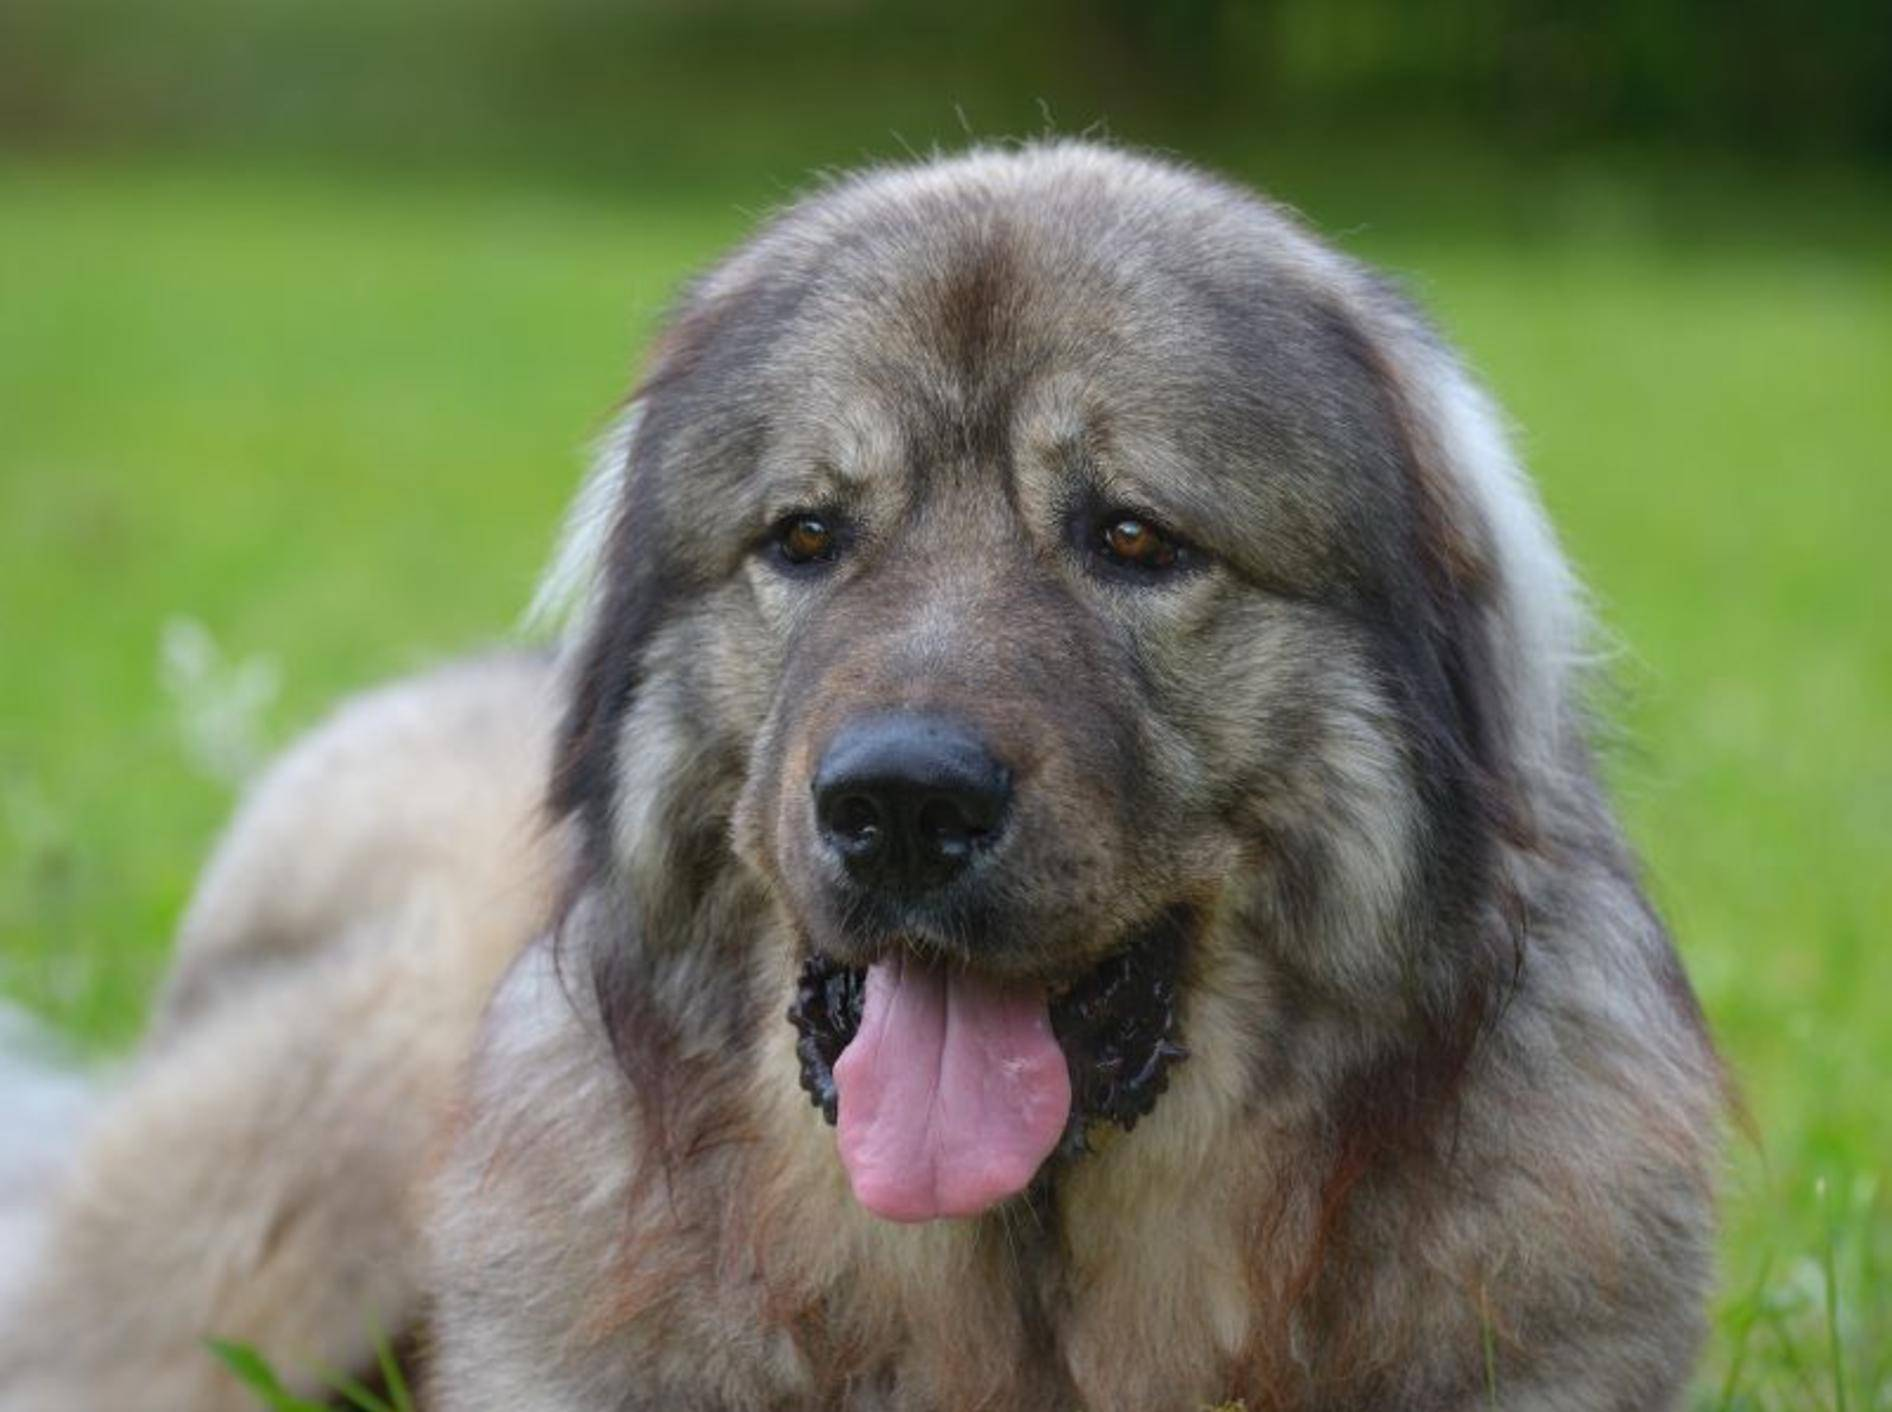 Kaukasischer Owtscharka: Kein Hund für Anfänger – Bild: Shutterstock / AnetaPics